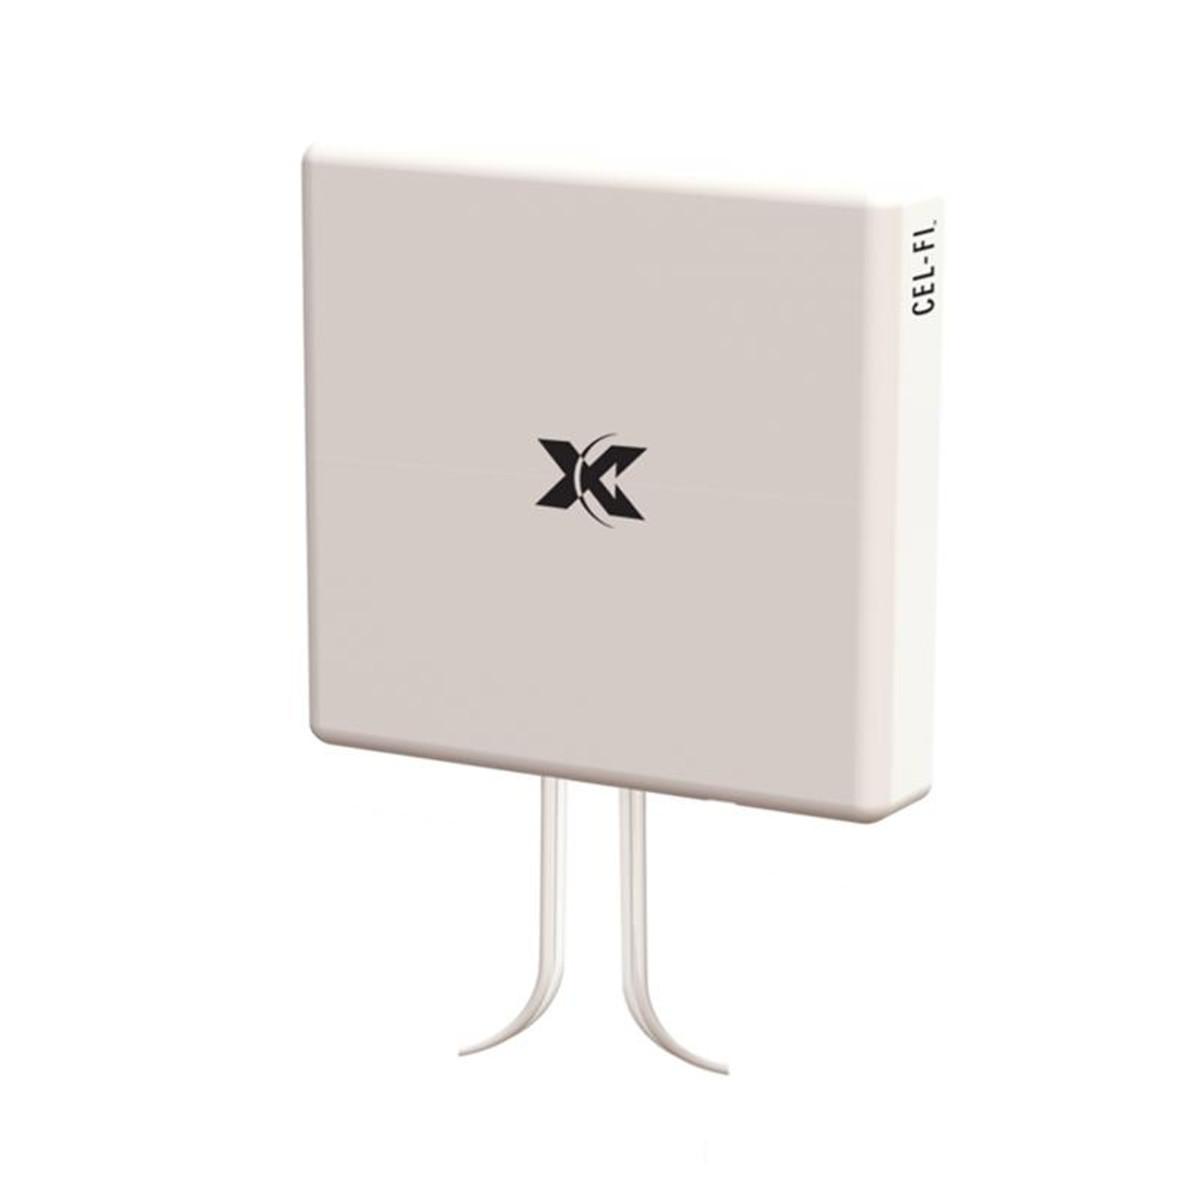 Cel-Fi Cel-Fi QUATRA 1000 MIMO Antenna with Bracket Mount - 2 LTE QMA M